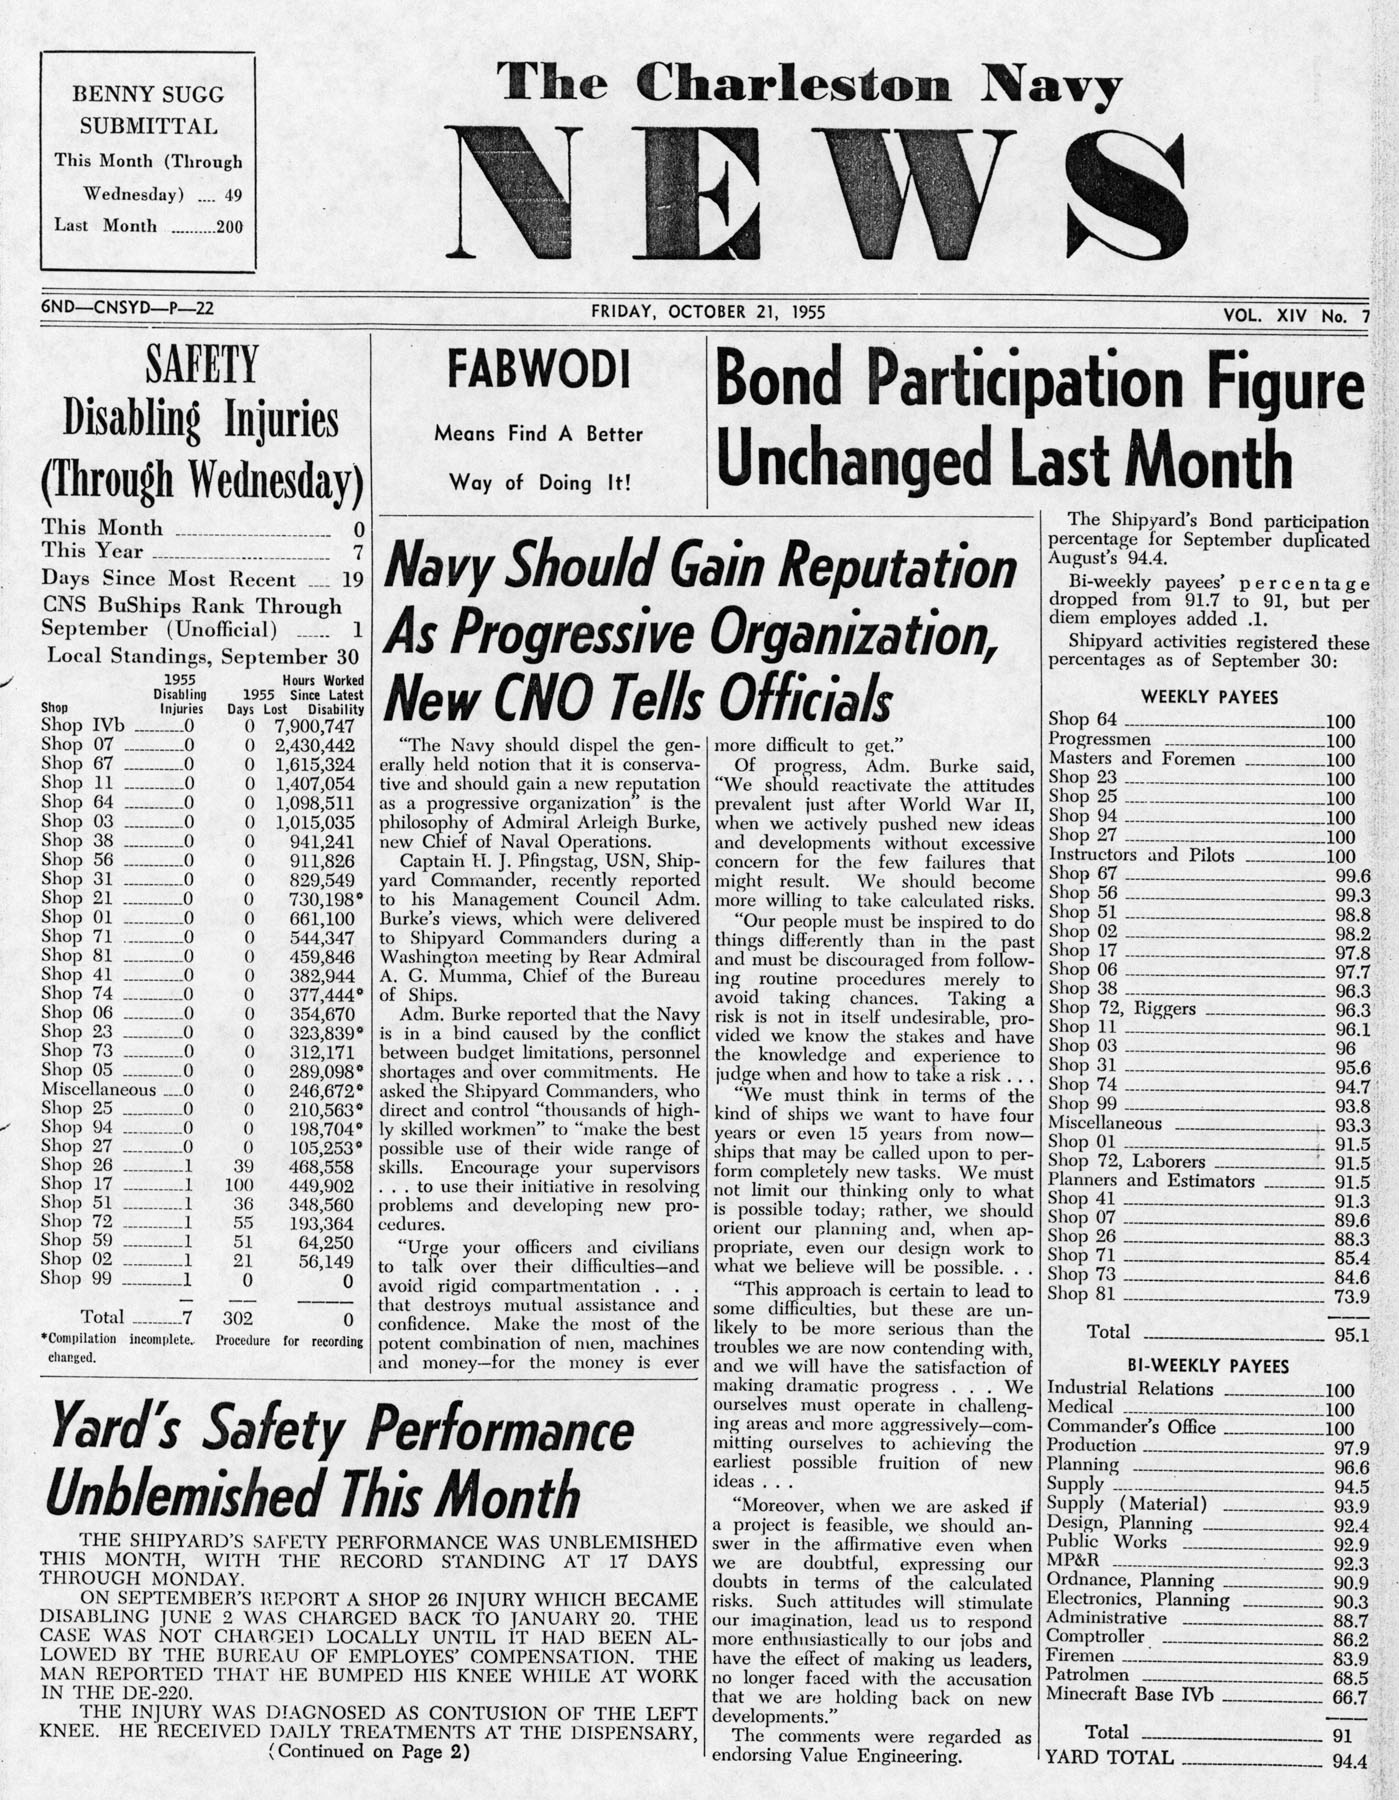 The Charleston Navy News, Volume 14, Edition 7, page i